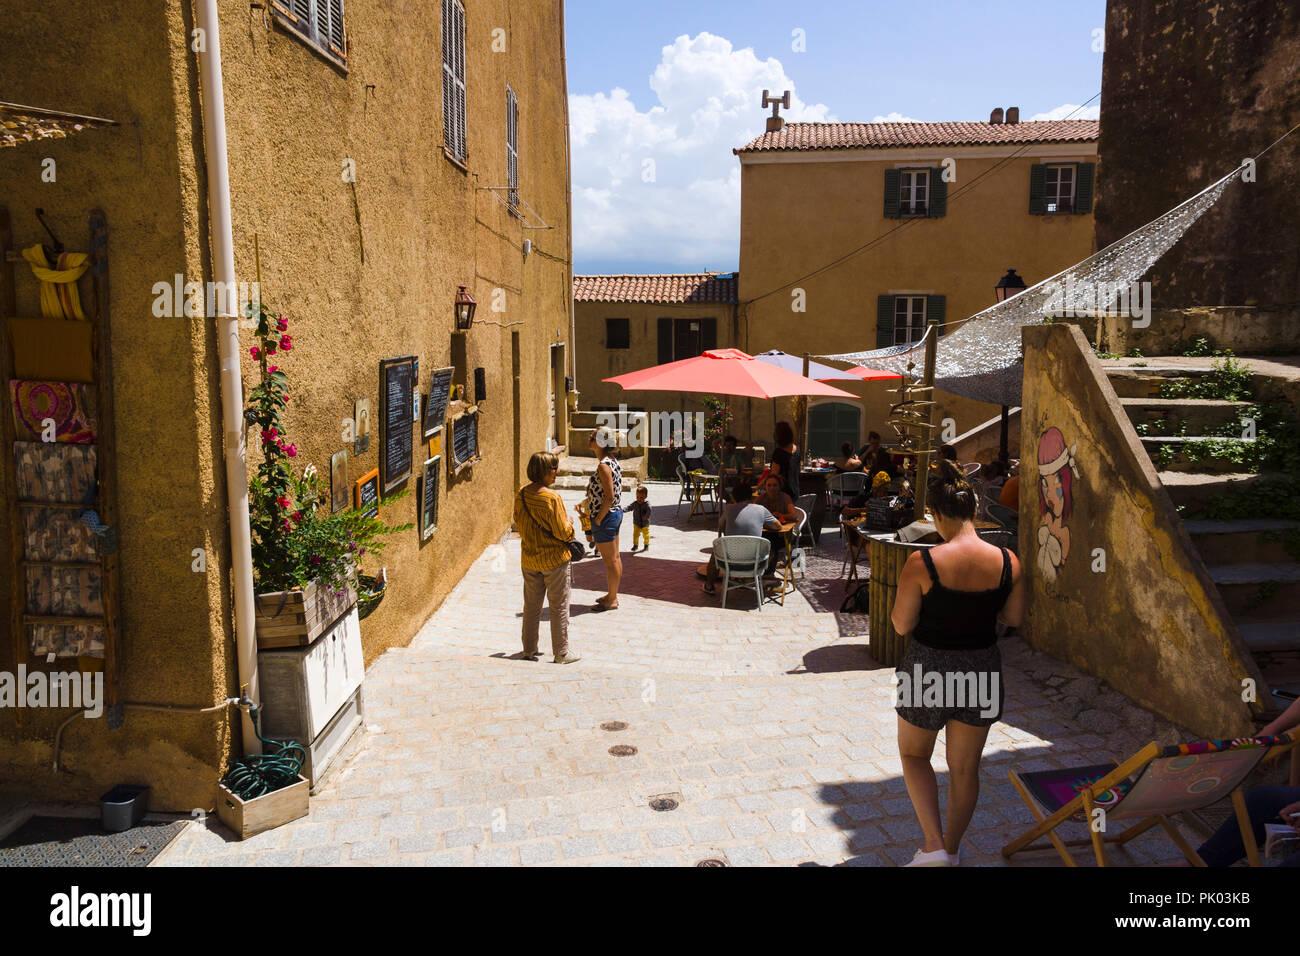 Lunchtime at outdoor restaurant patio in Calvi citadel. Calvi, Corsica, France - Stock Image